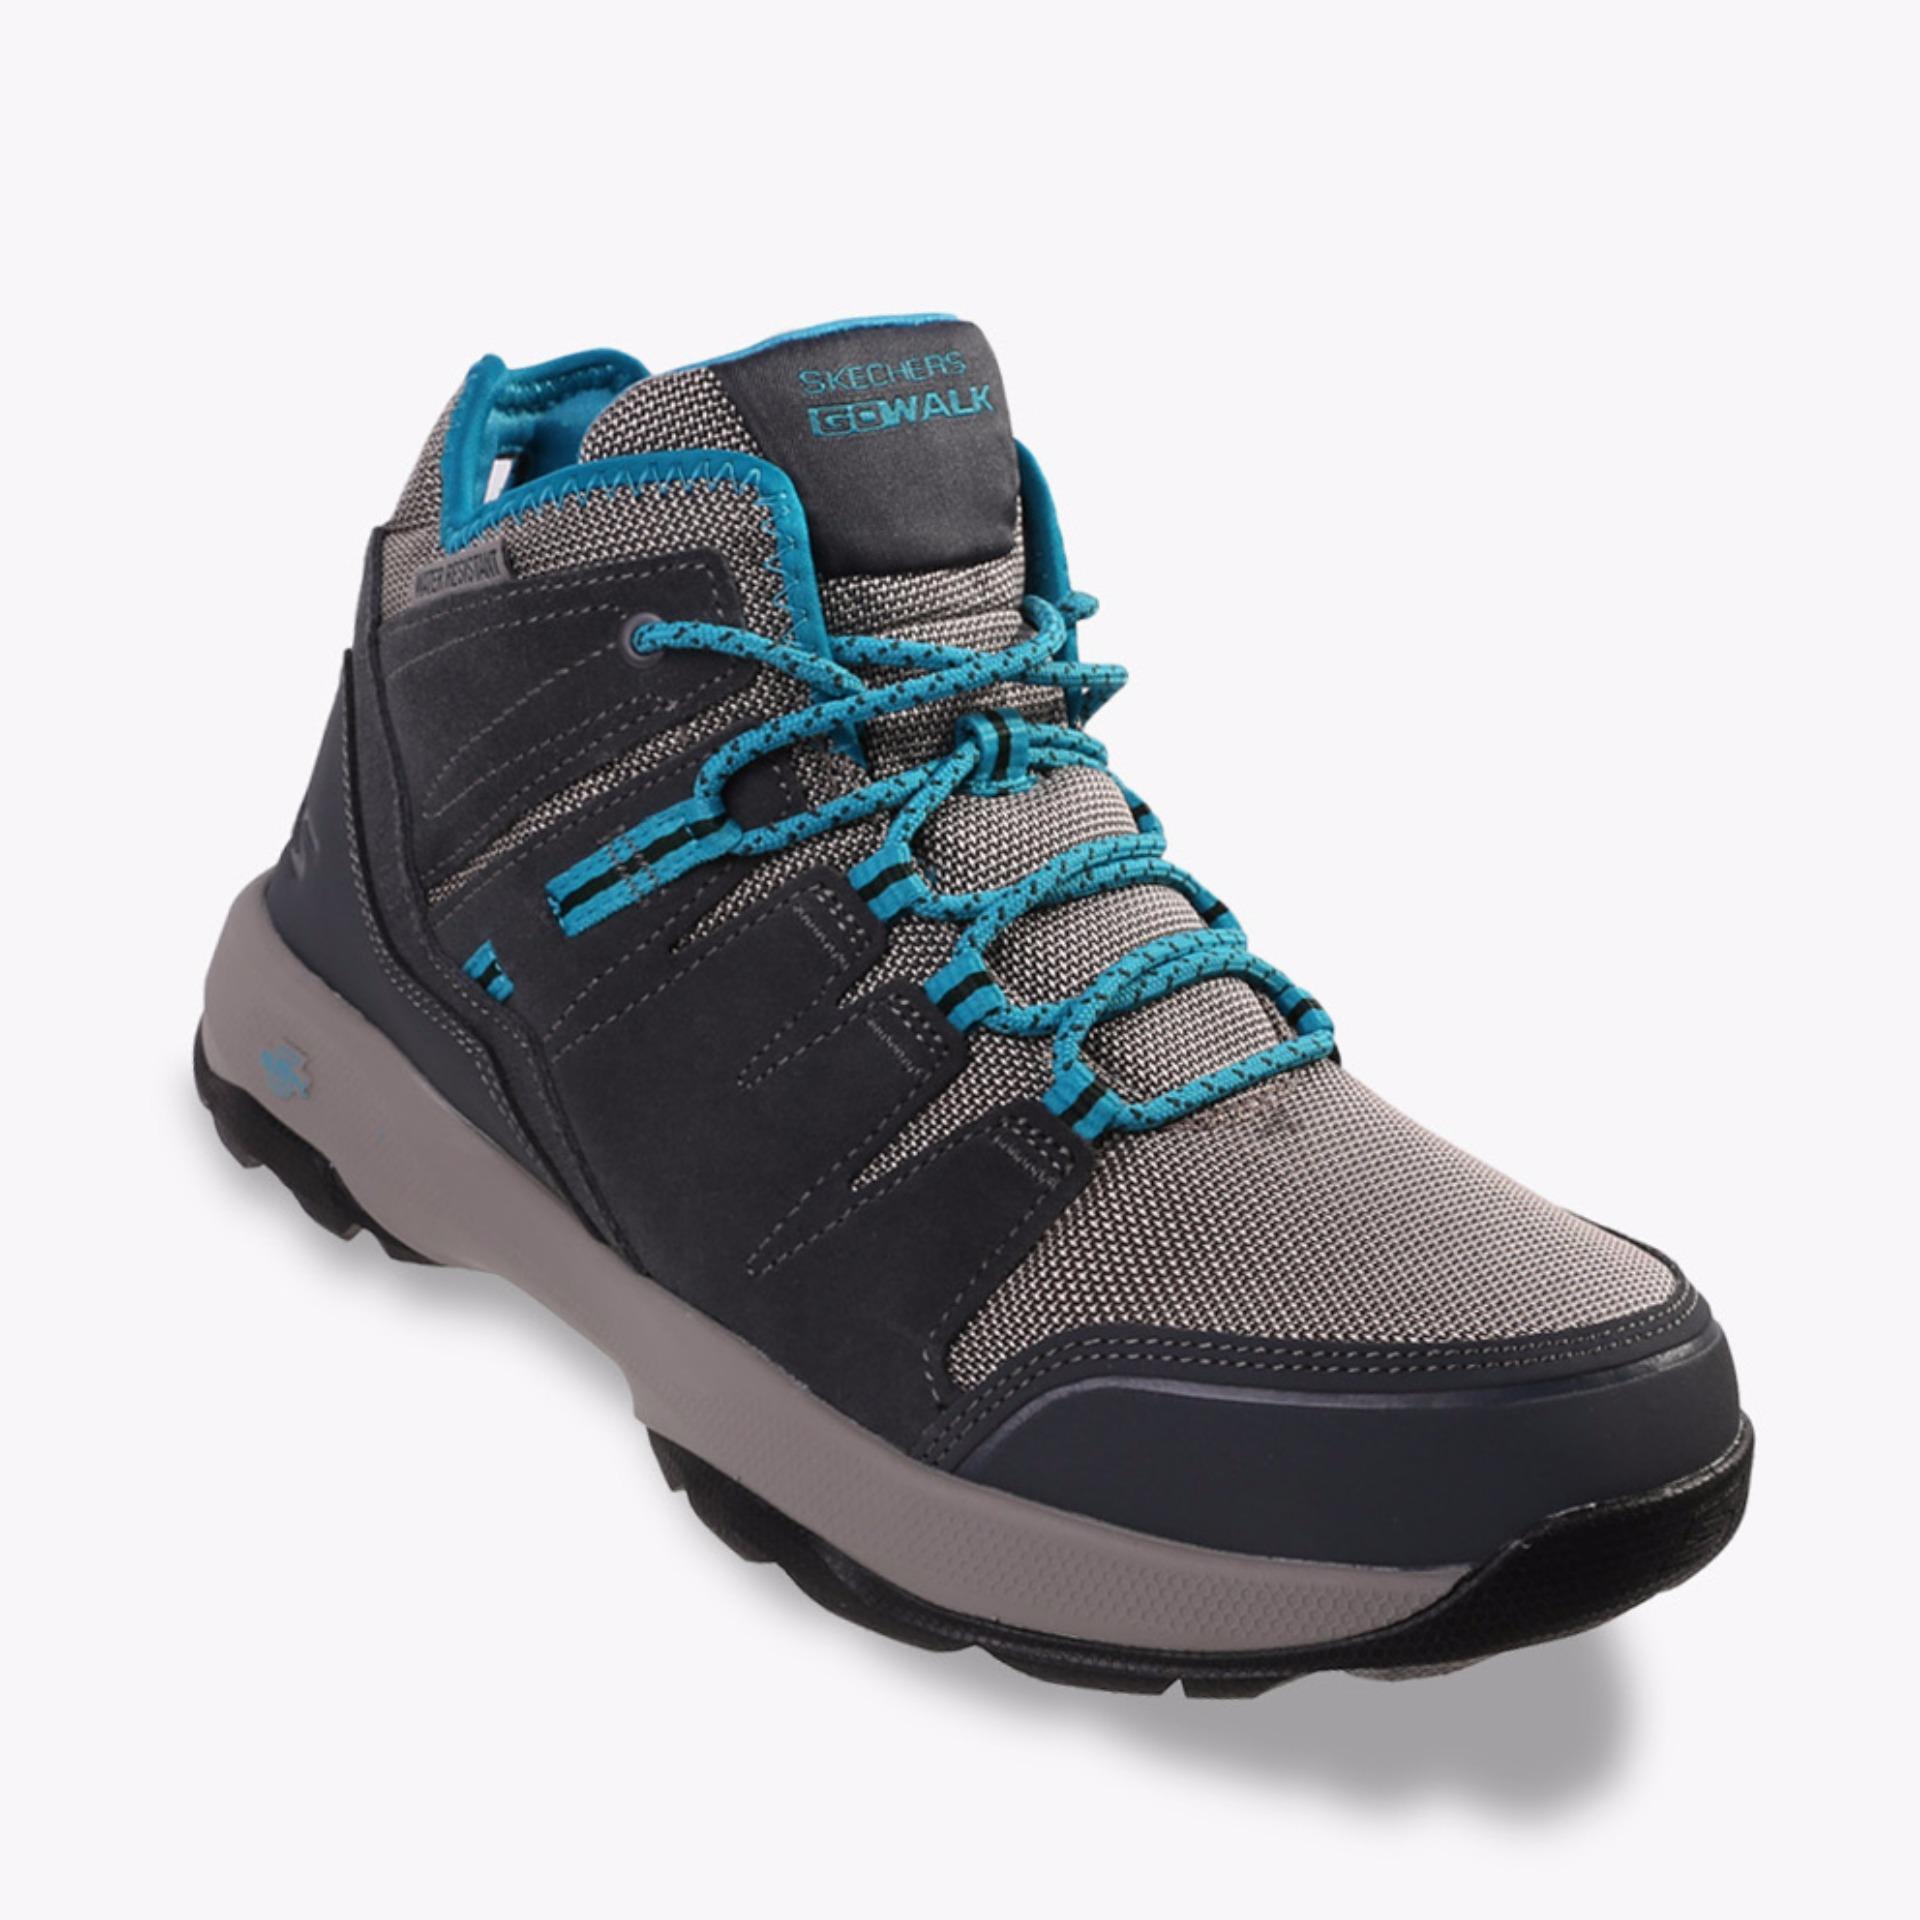 Jual Skechers Gowalk Outdoors 2 Women S Sneakers Shoes Charcoal Baru